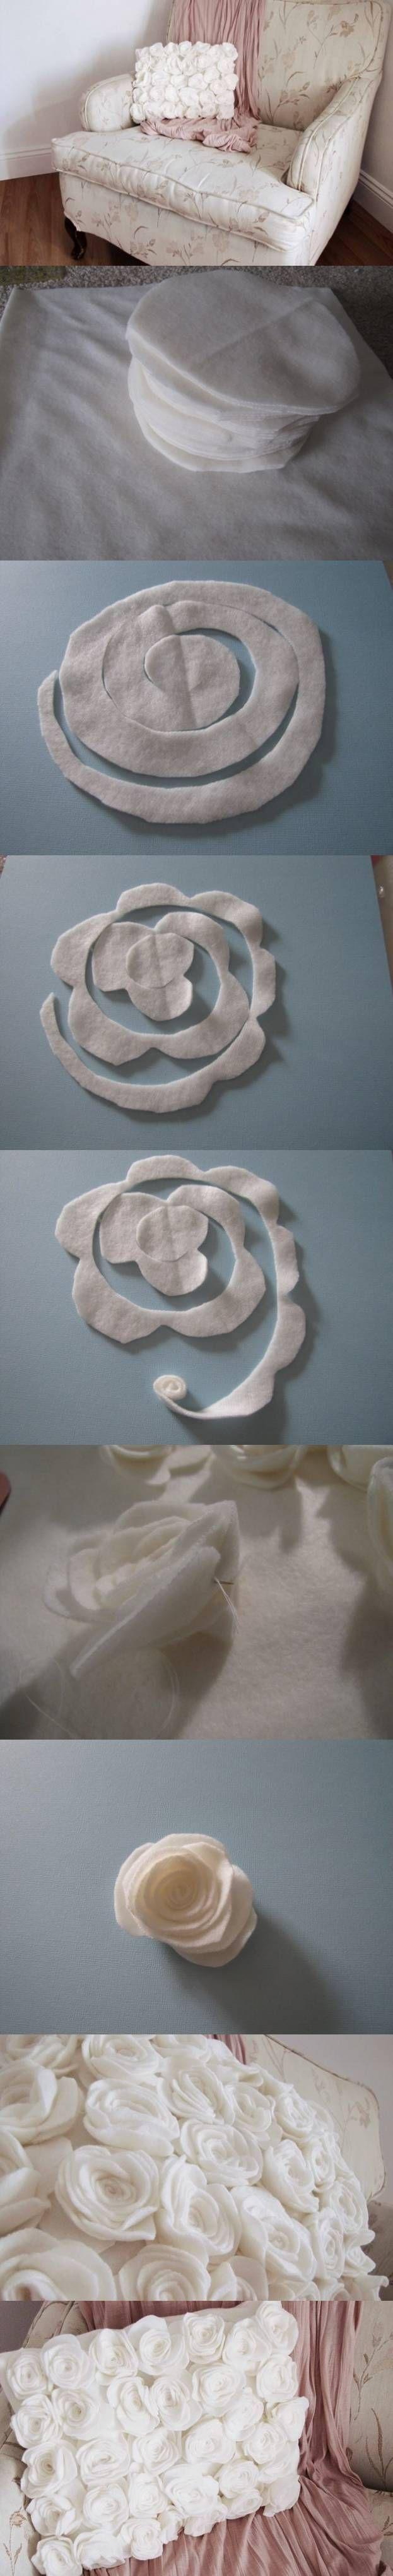 DIY Rose Fleece Pillow